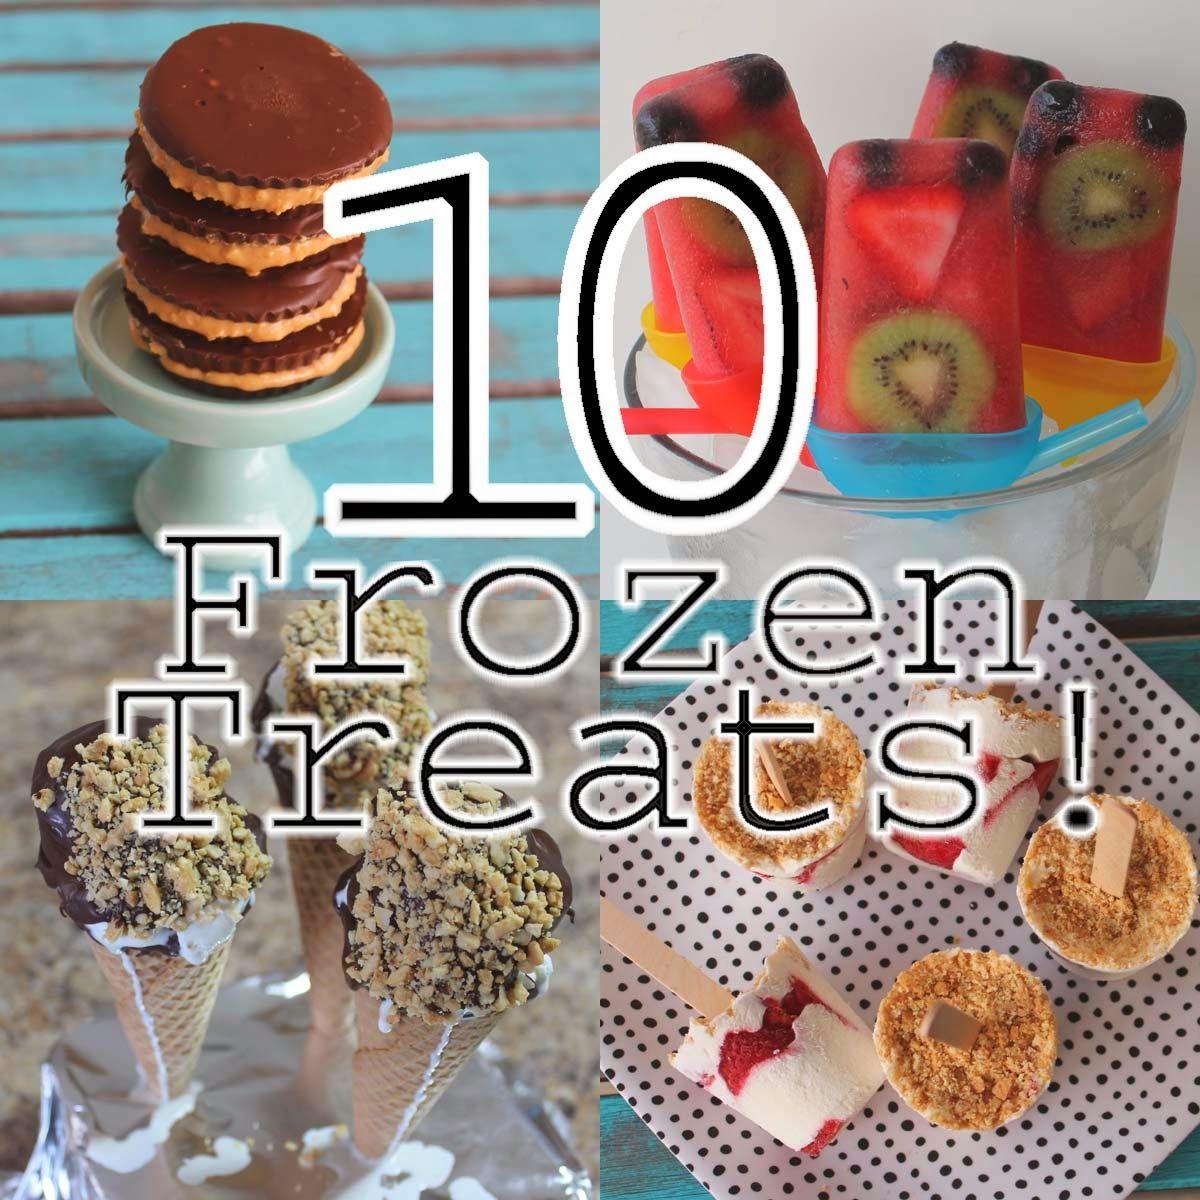 10 Frozen Treats! (With images) Frozen treats, Frozen